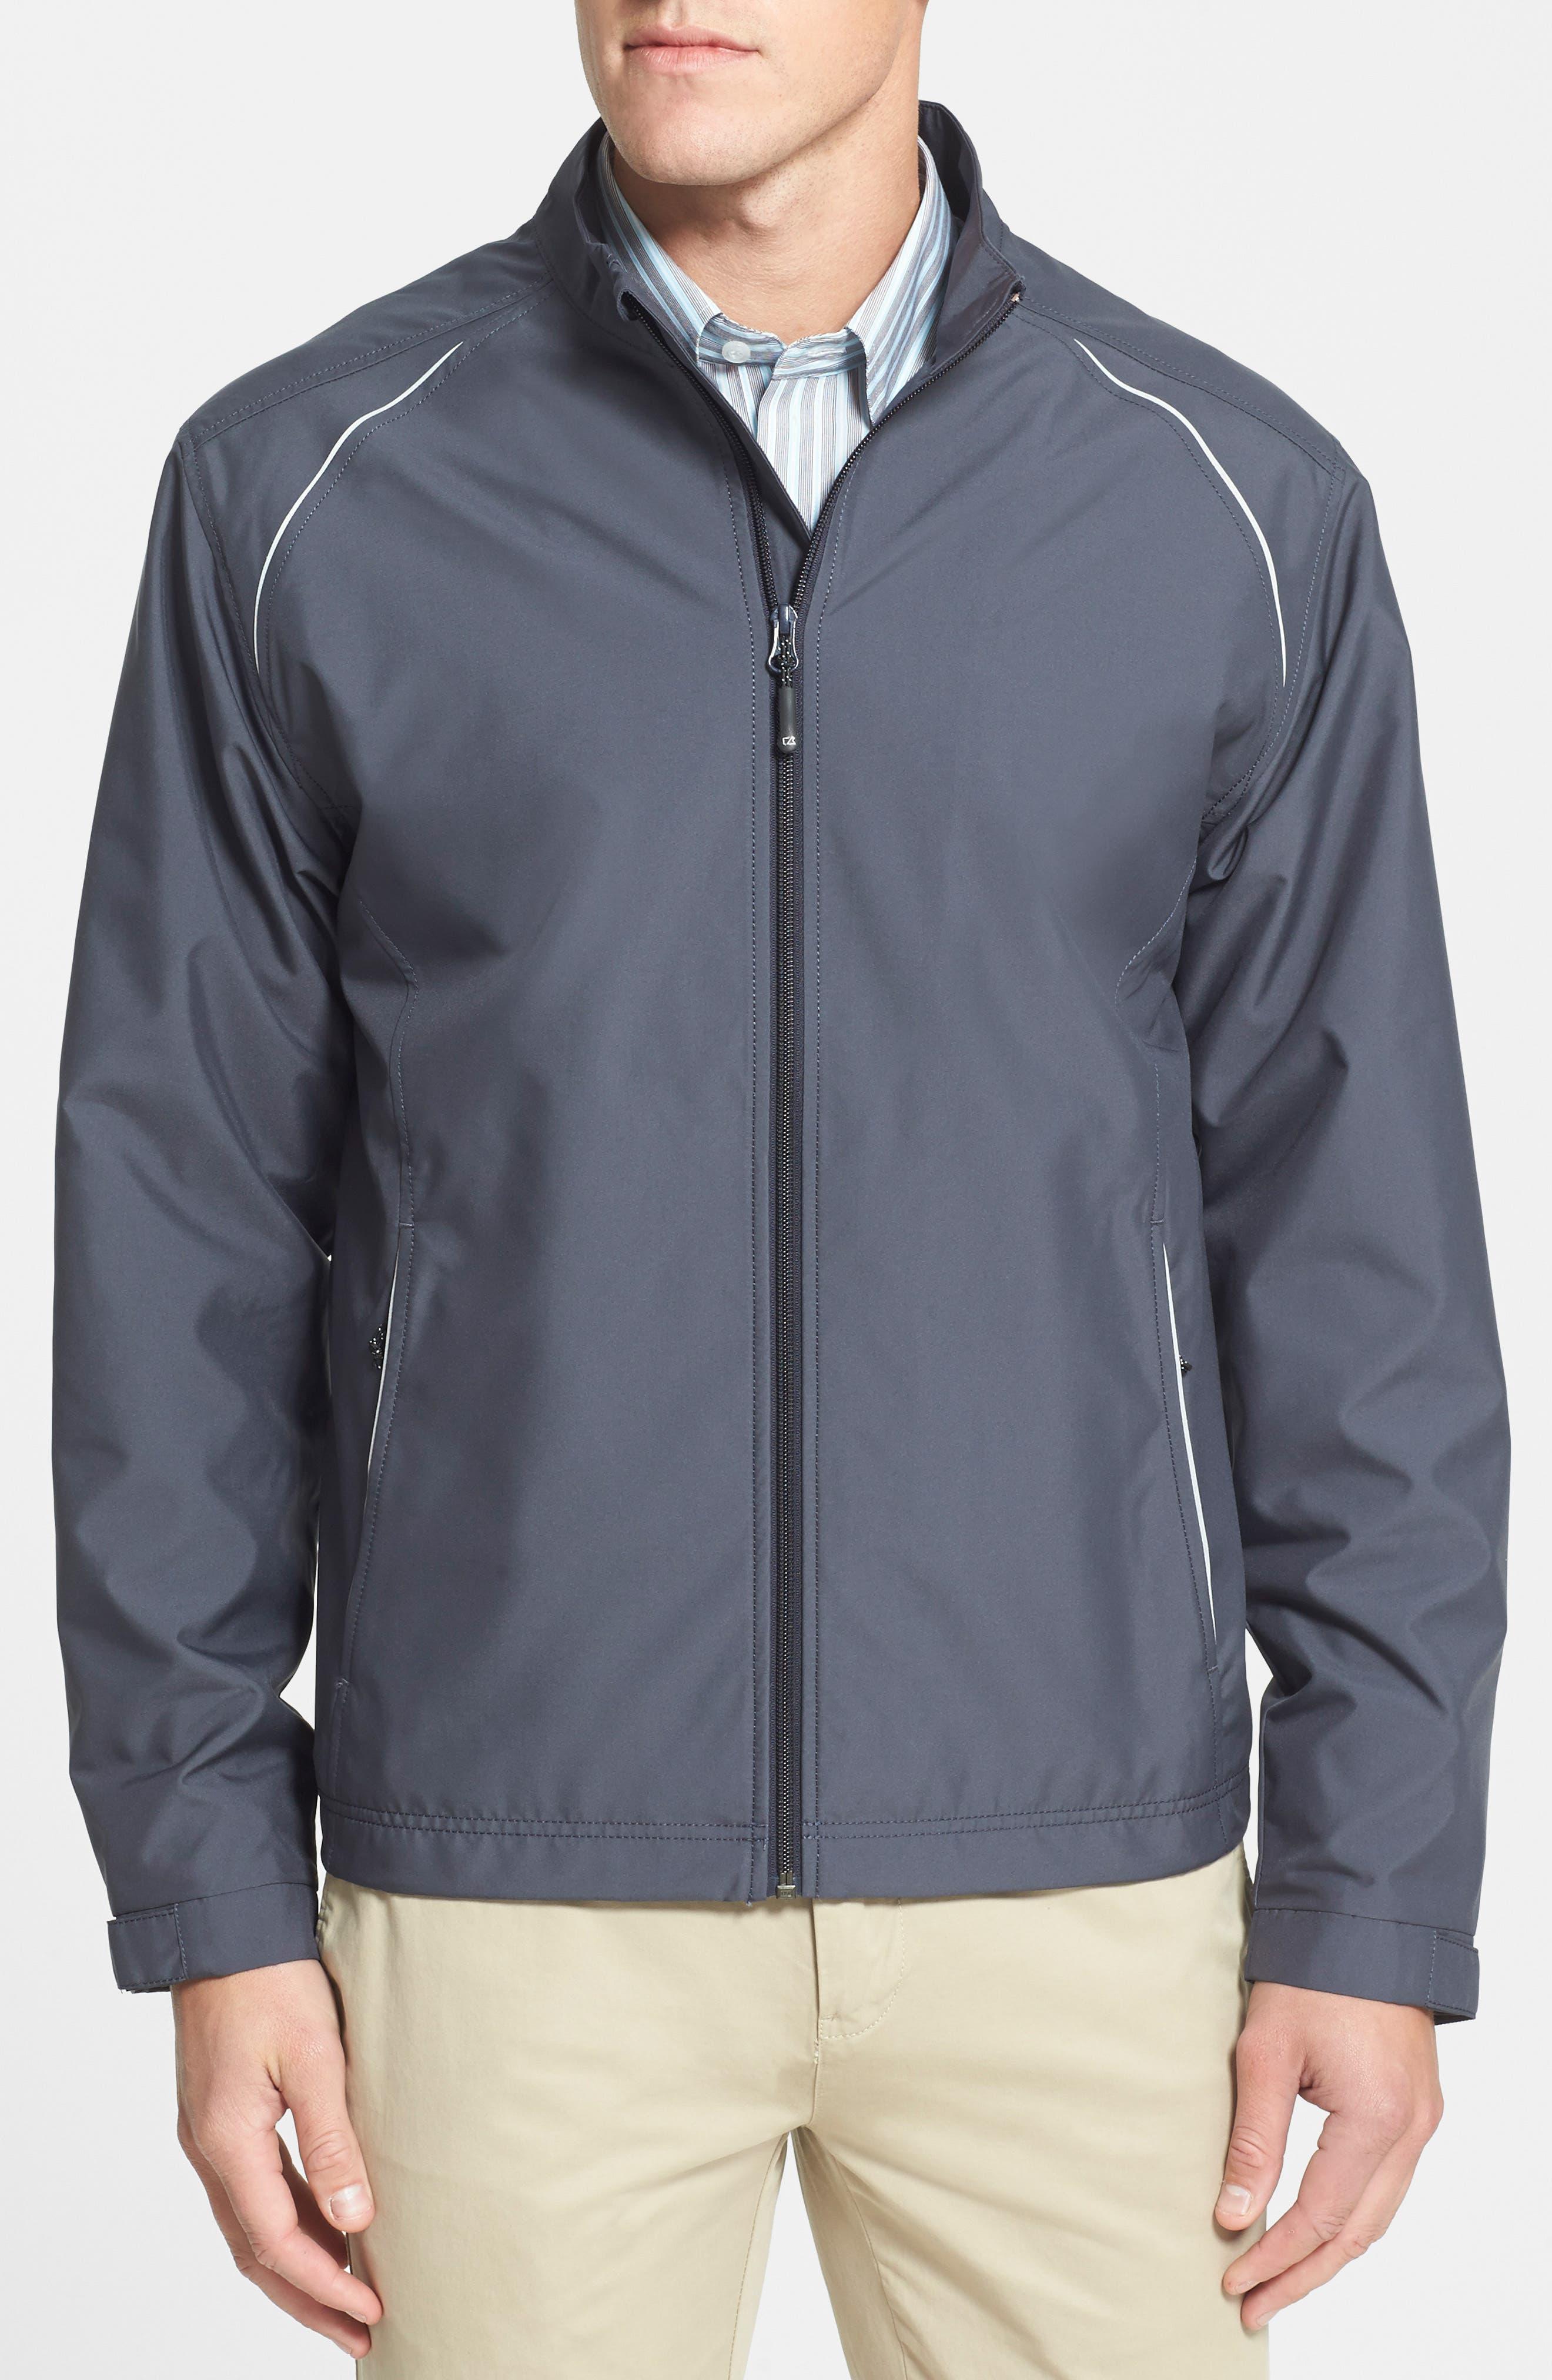 CUTTER & BUCK, Beacon WeatherTec Wind & Water Resistant Jacket, Alternate thumbnail 3, color, ONYX GREY